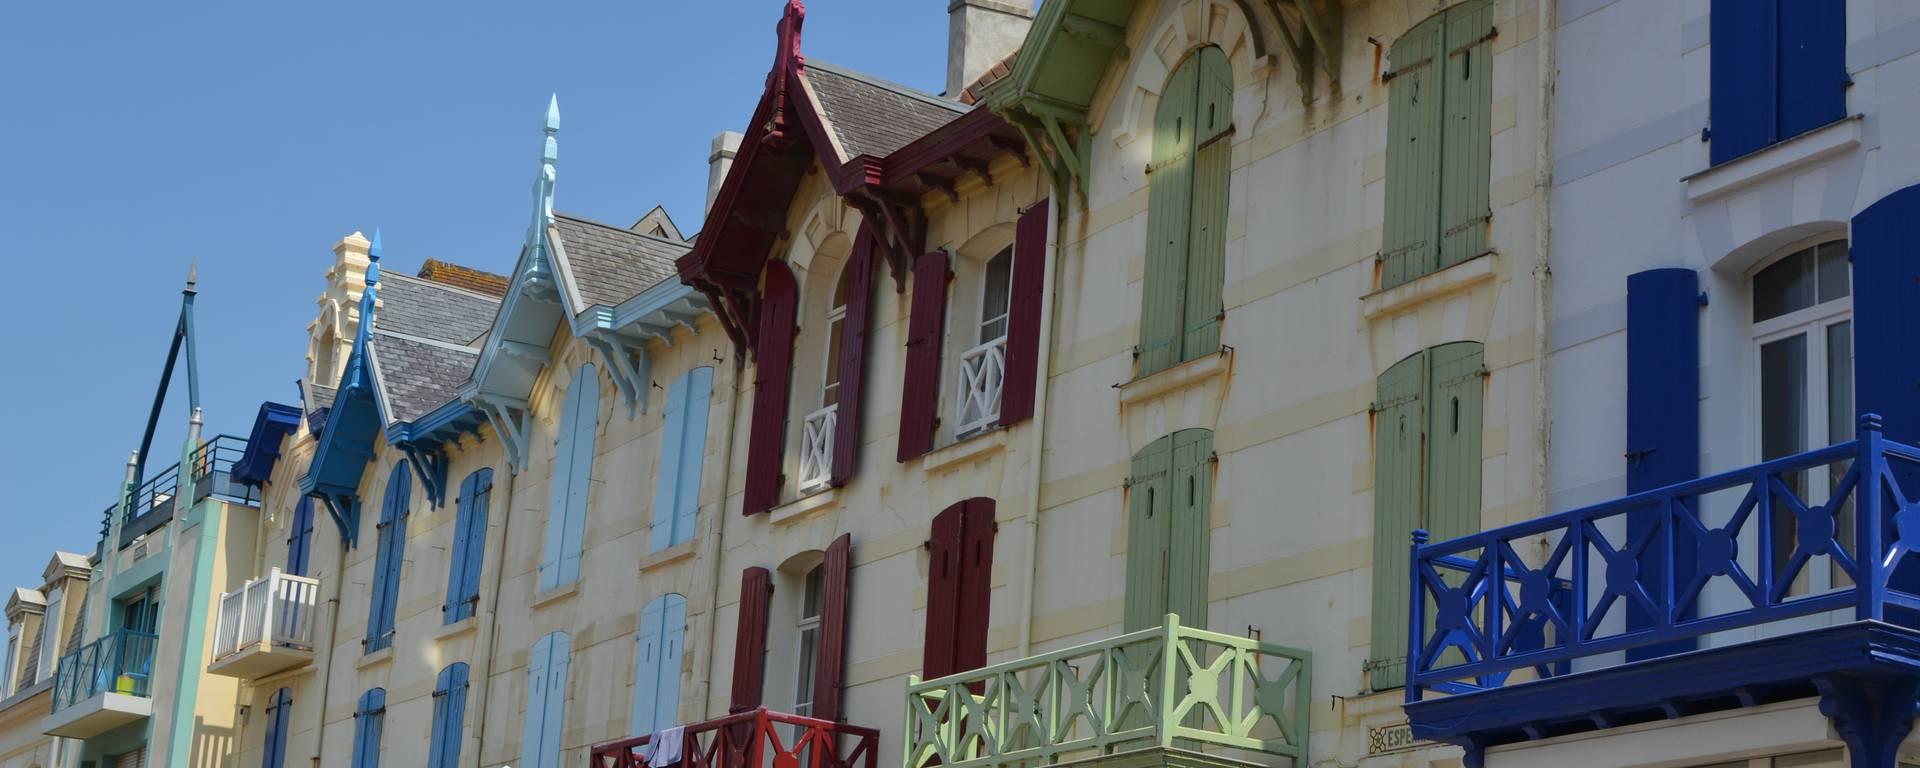 Villas wimereusiennes